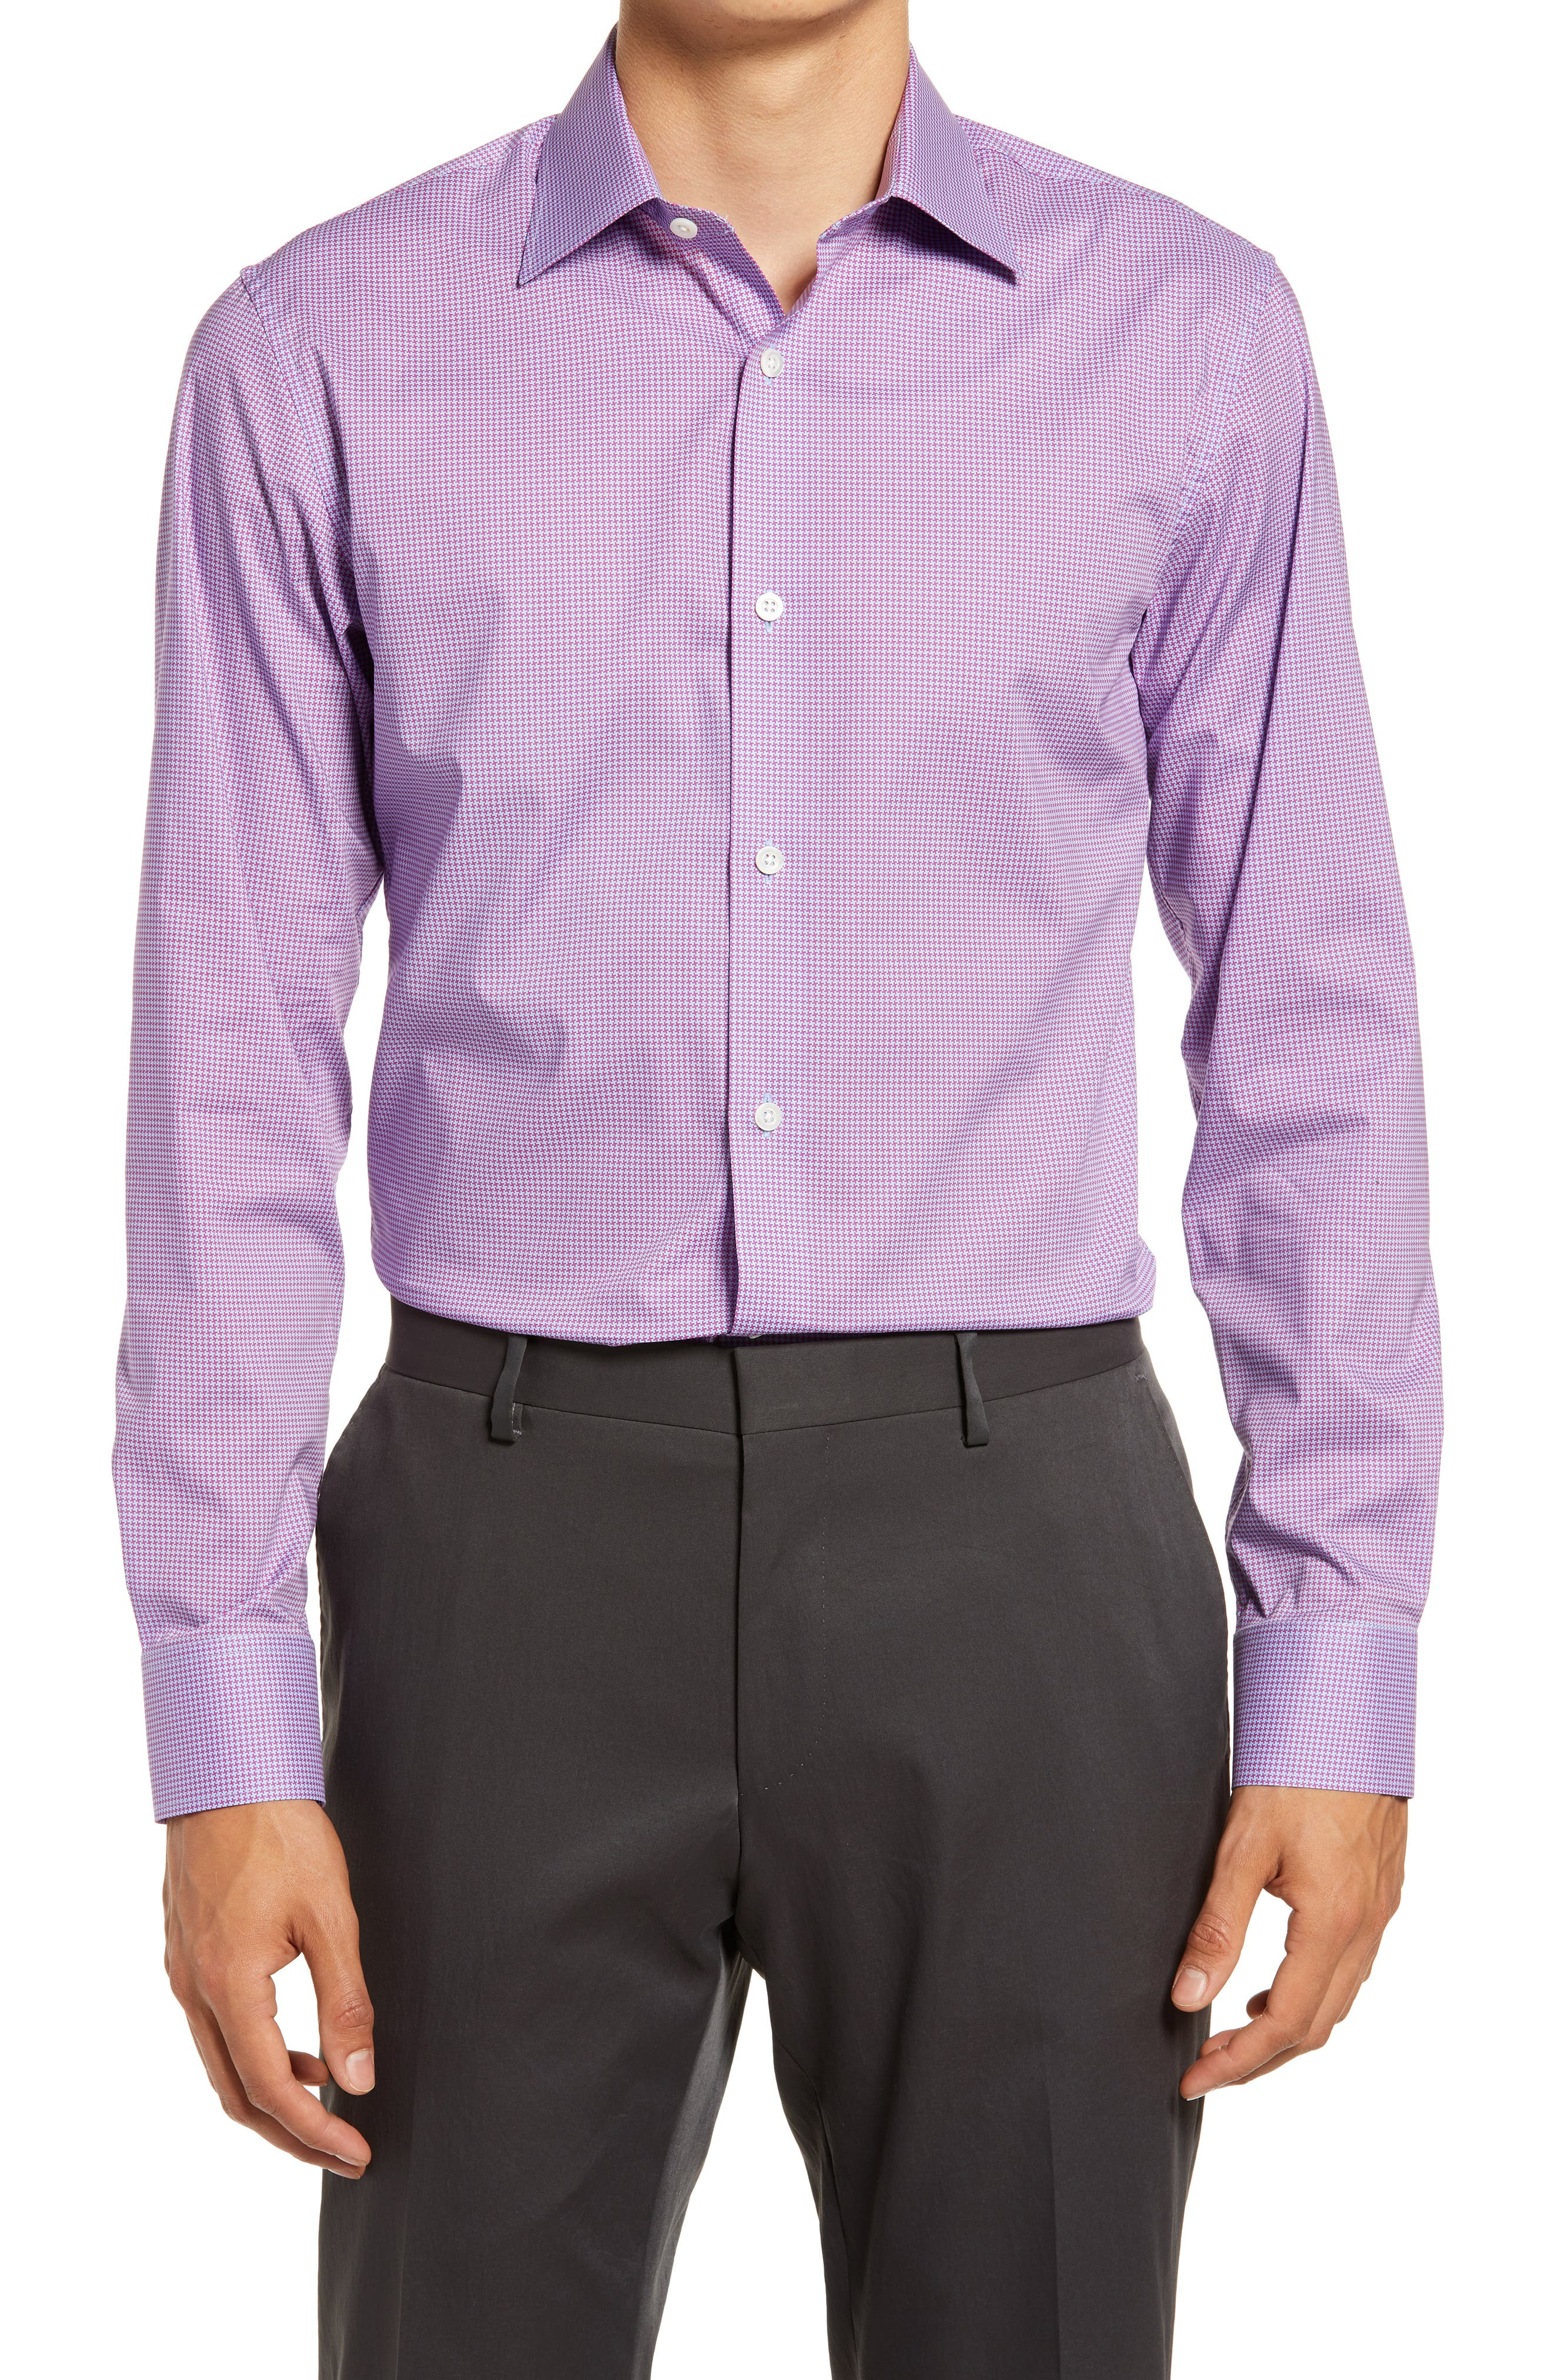 Jetsetter Slim Fit Houndstooth Stretch Dress Shirt